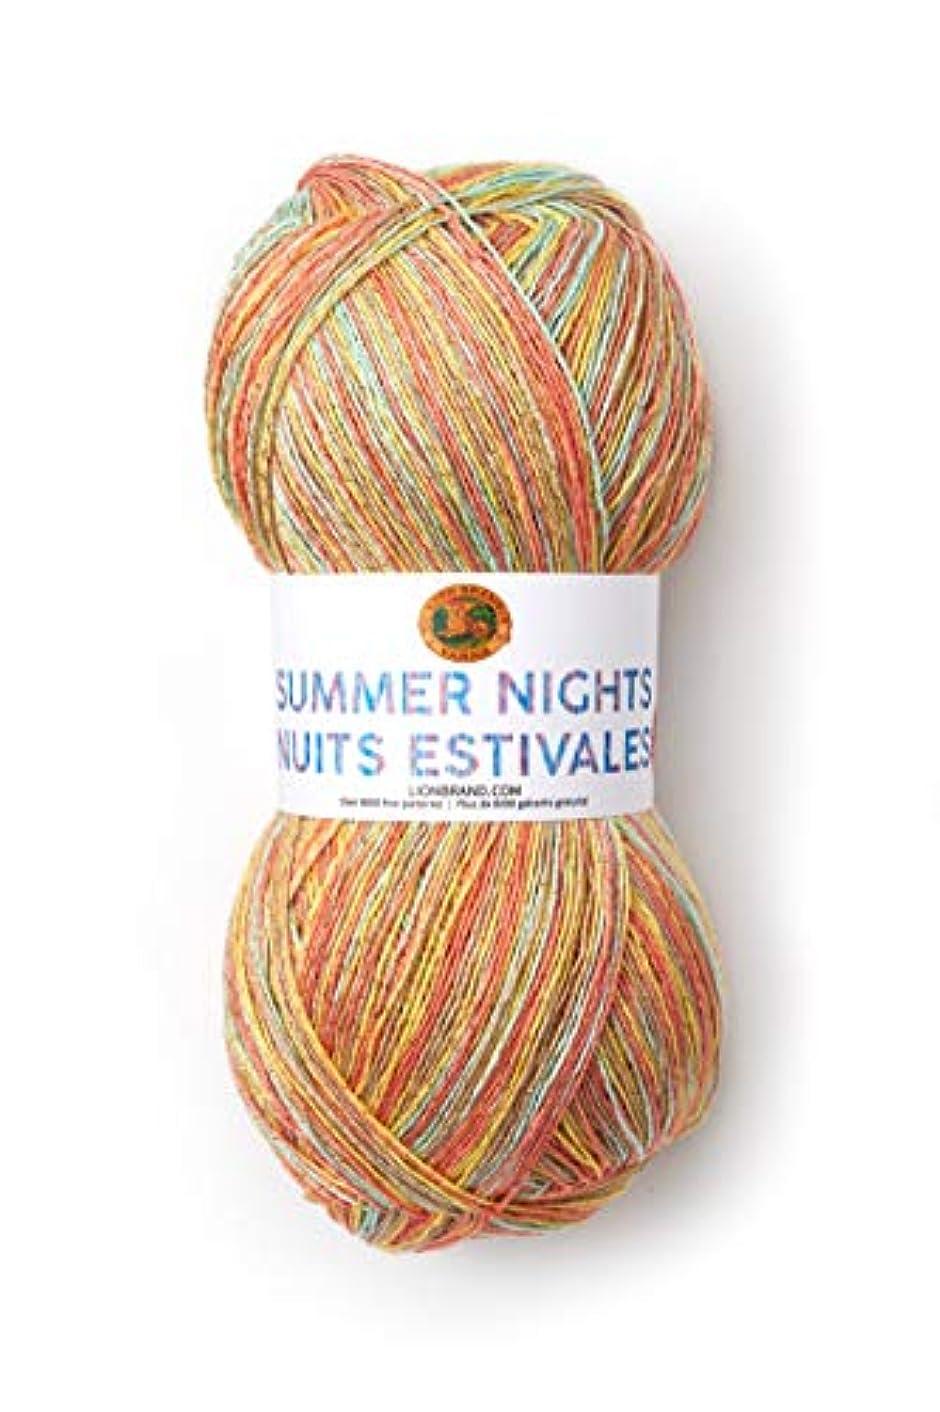 Lion Brand Yarn 512-312 Summer Nights Bonus Bundle Yarn, Sunset (1 skein/ball)